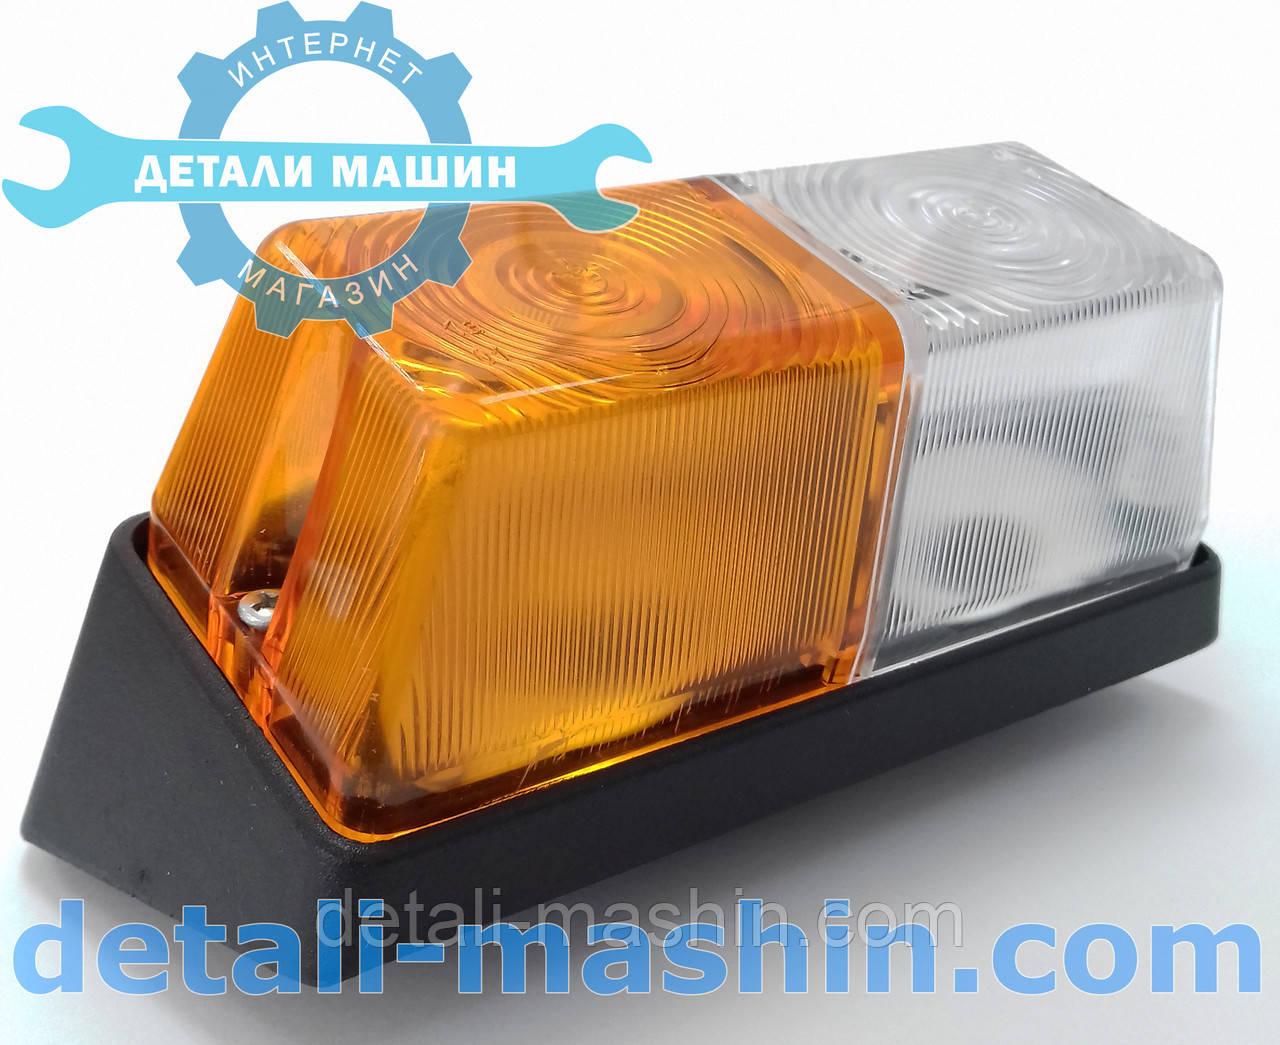 Фонарь передний МТЗ ФП-204 металлический корпус